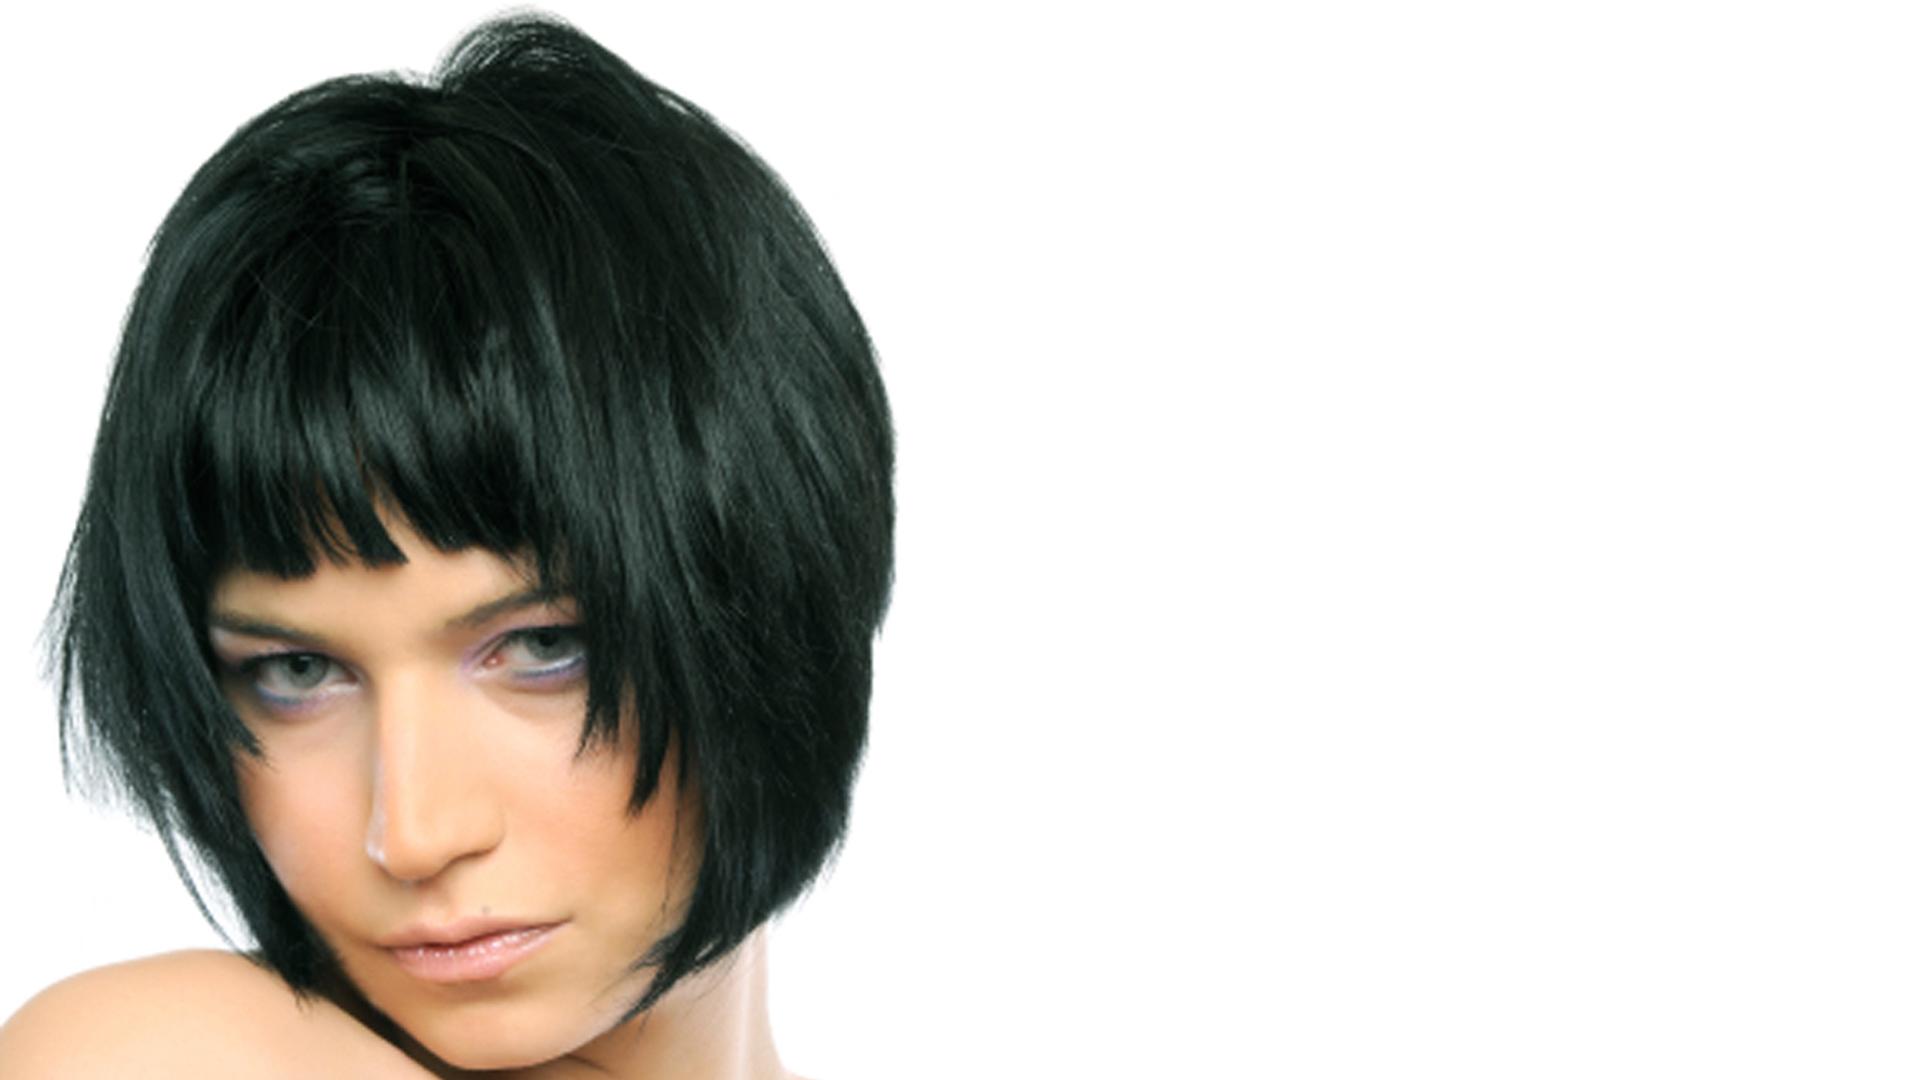 Anthony Jones Hair Salons Hair Style Selection 1005